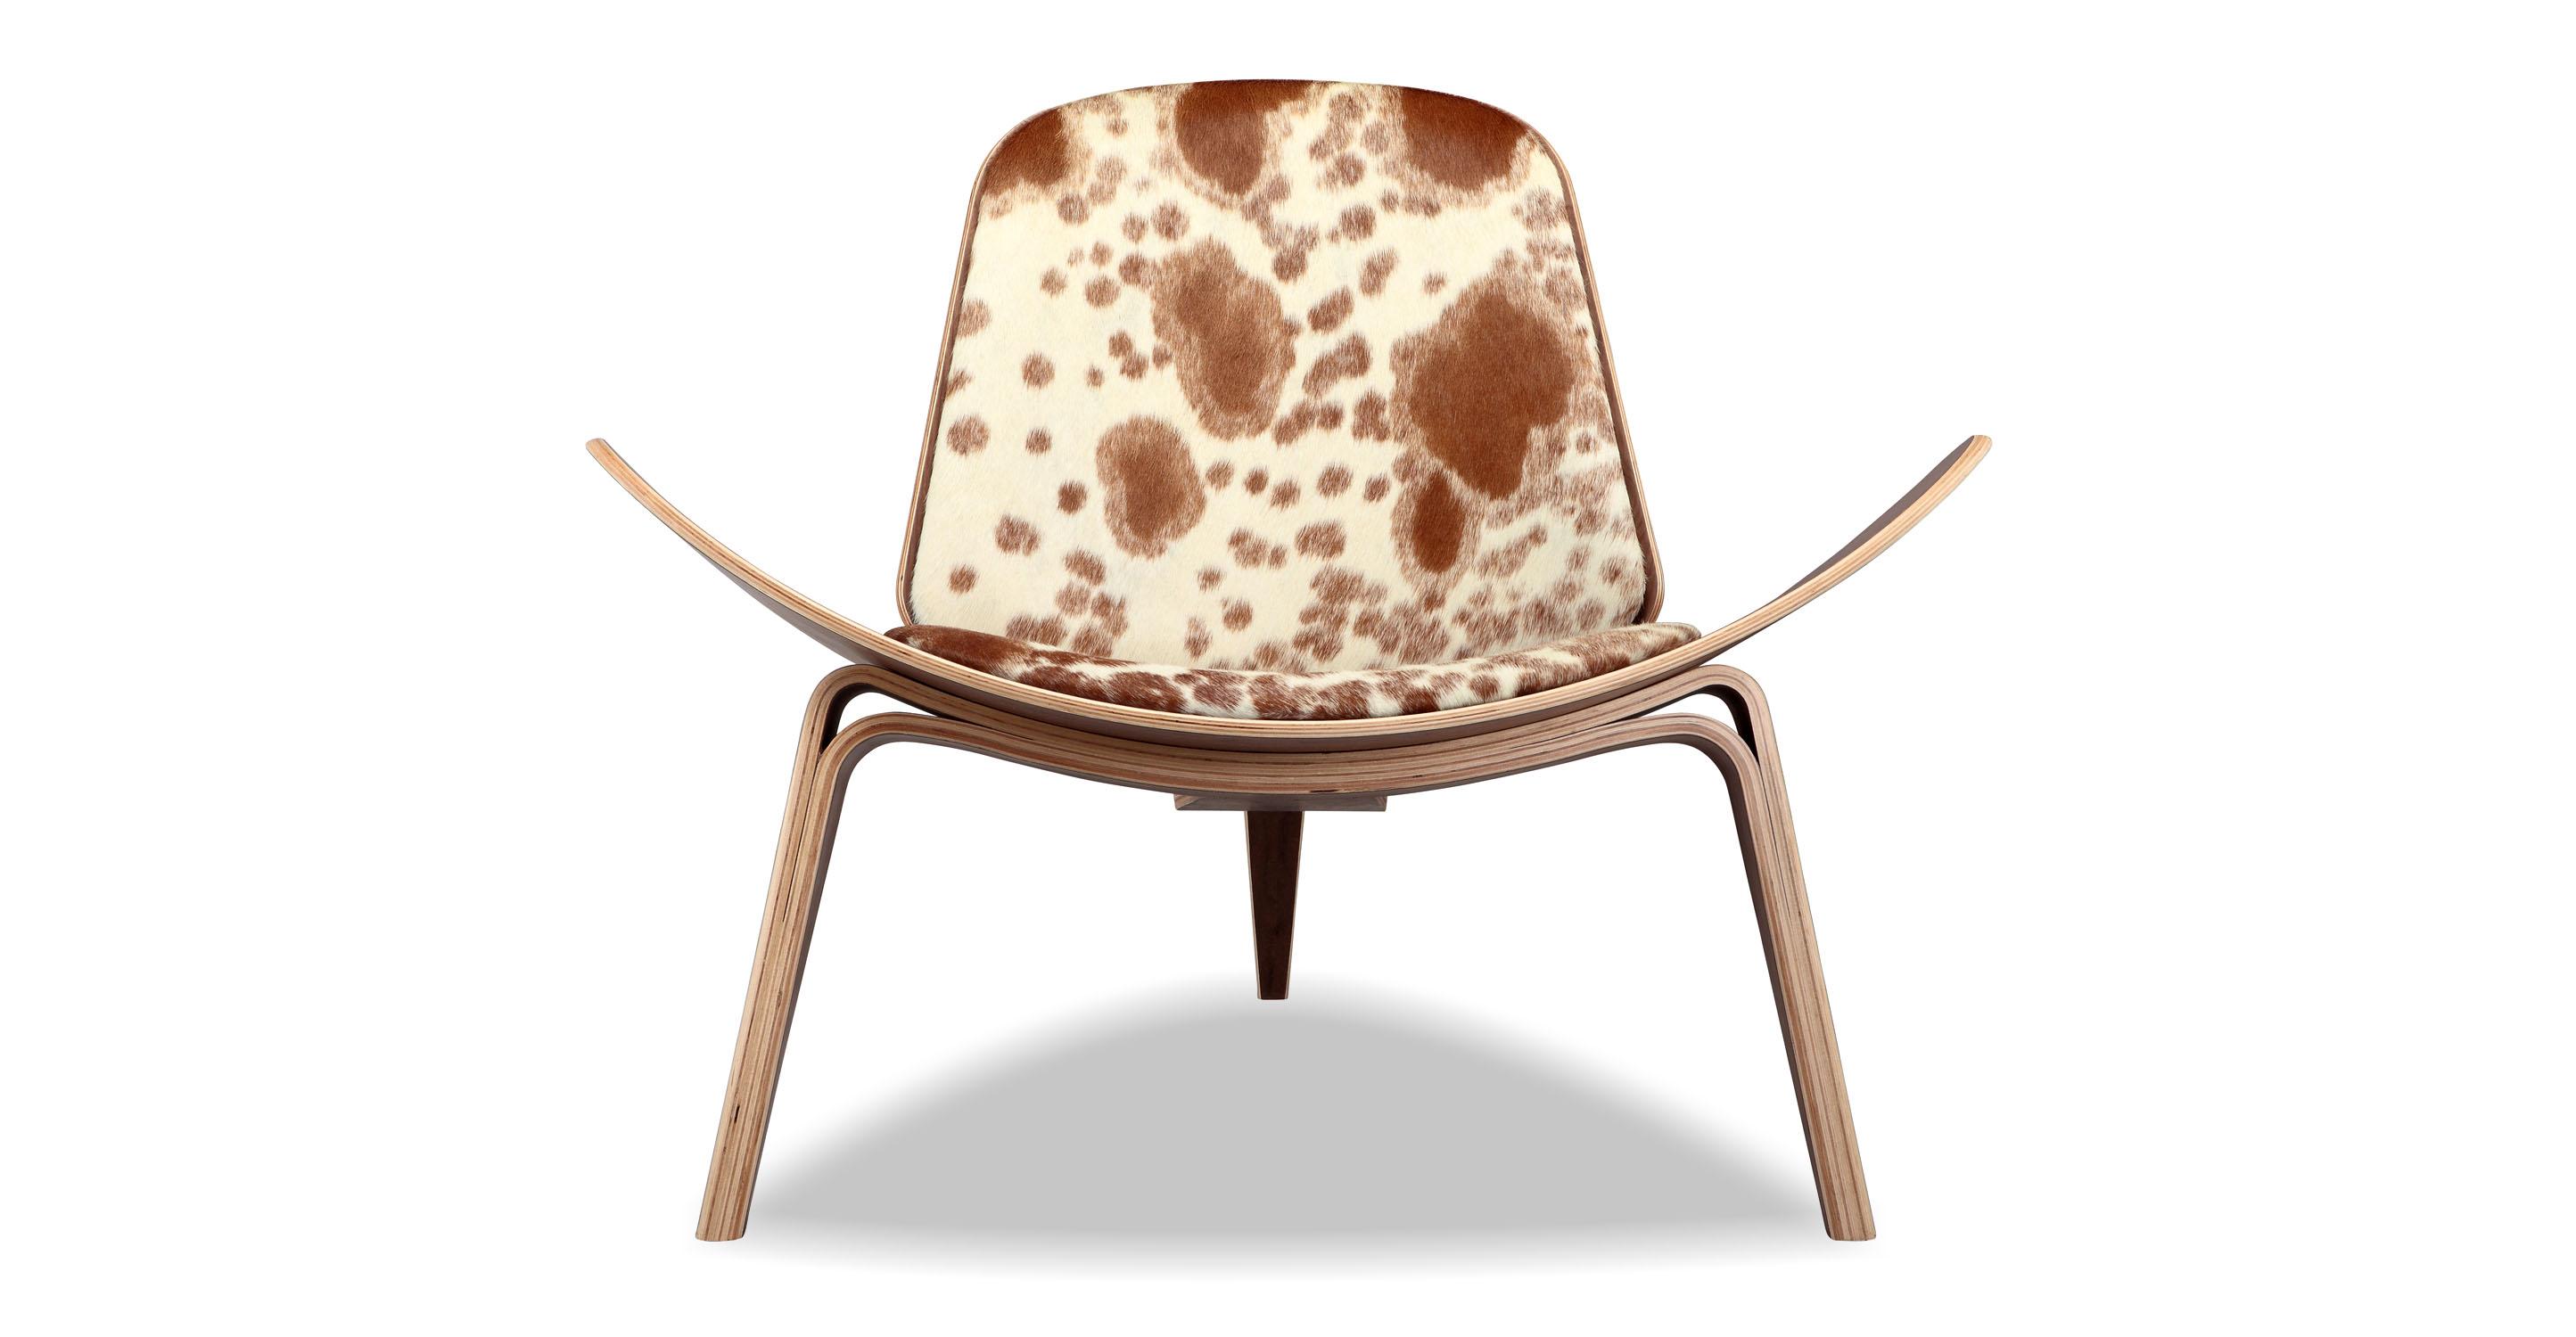 Tripod Leather Chair 2-pc Set, Walnut/Brown & White Cowhide